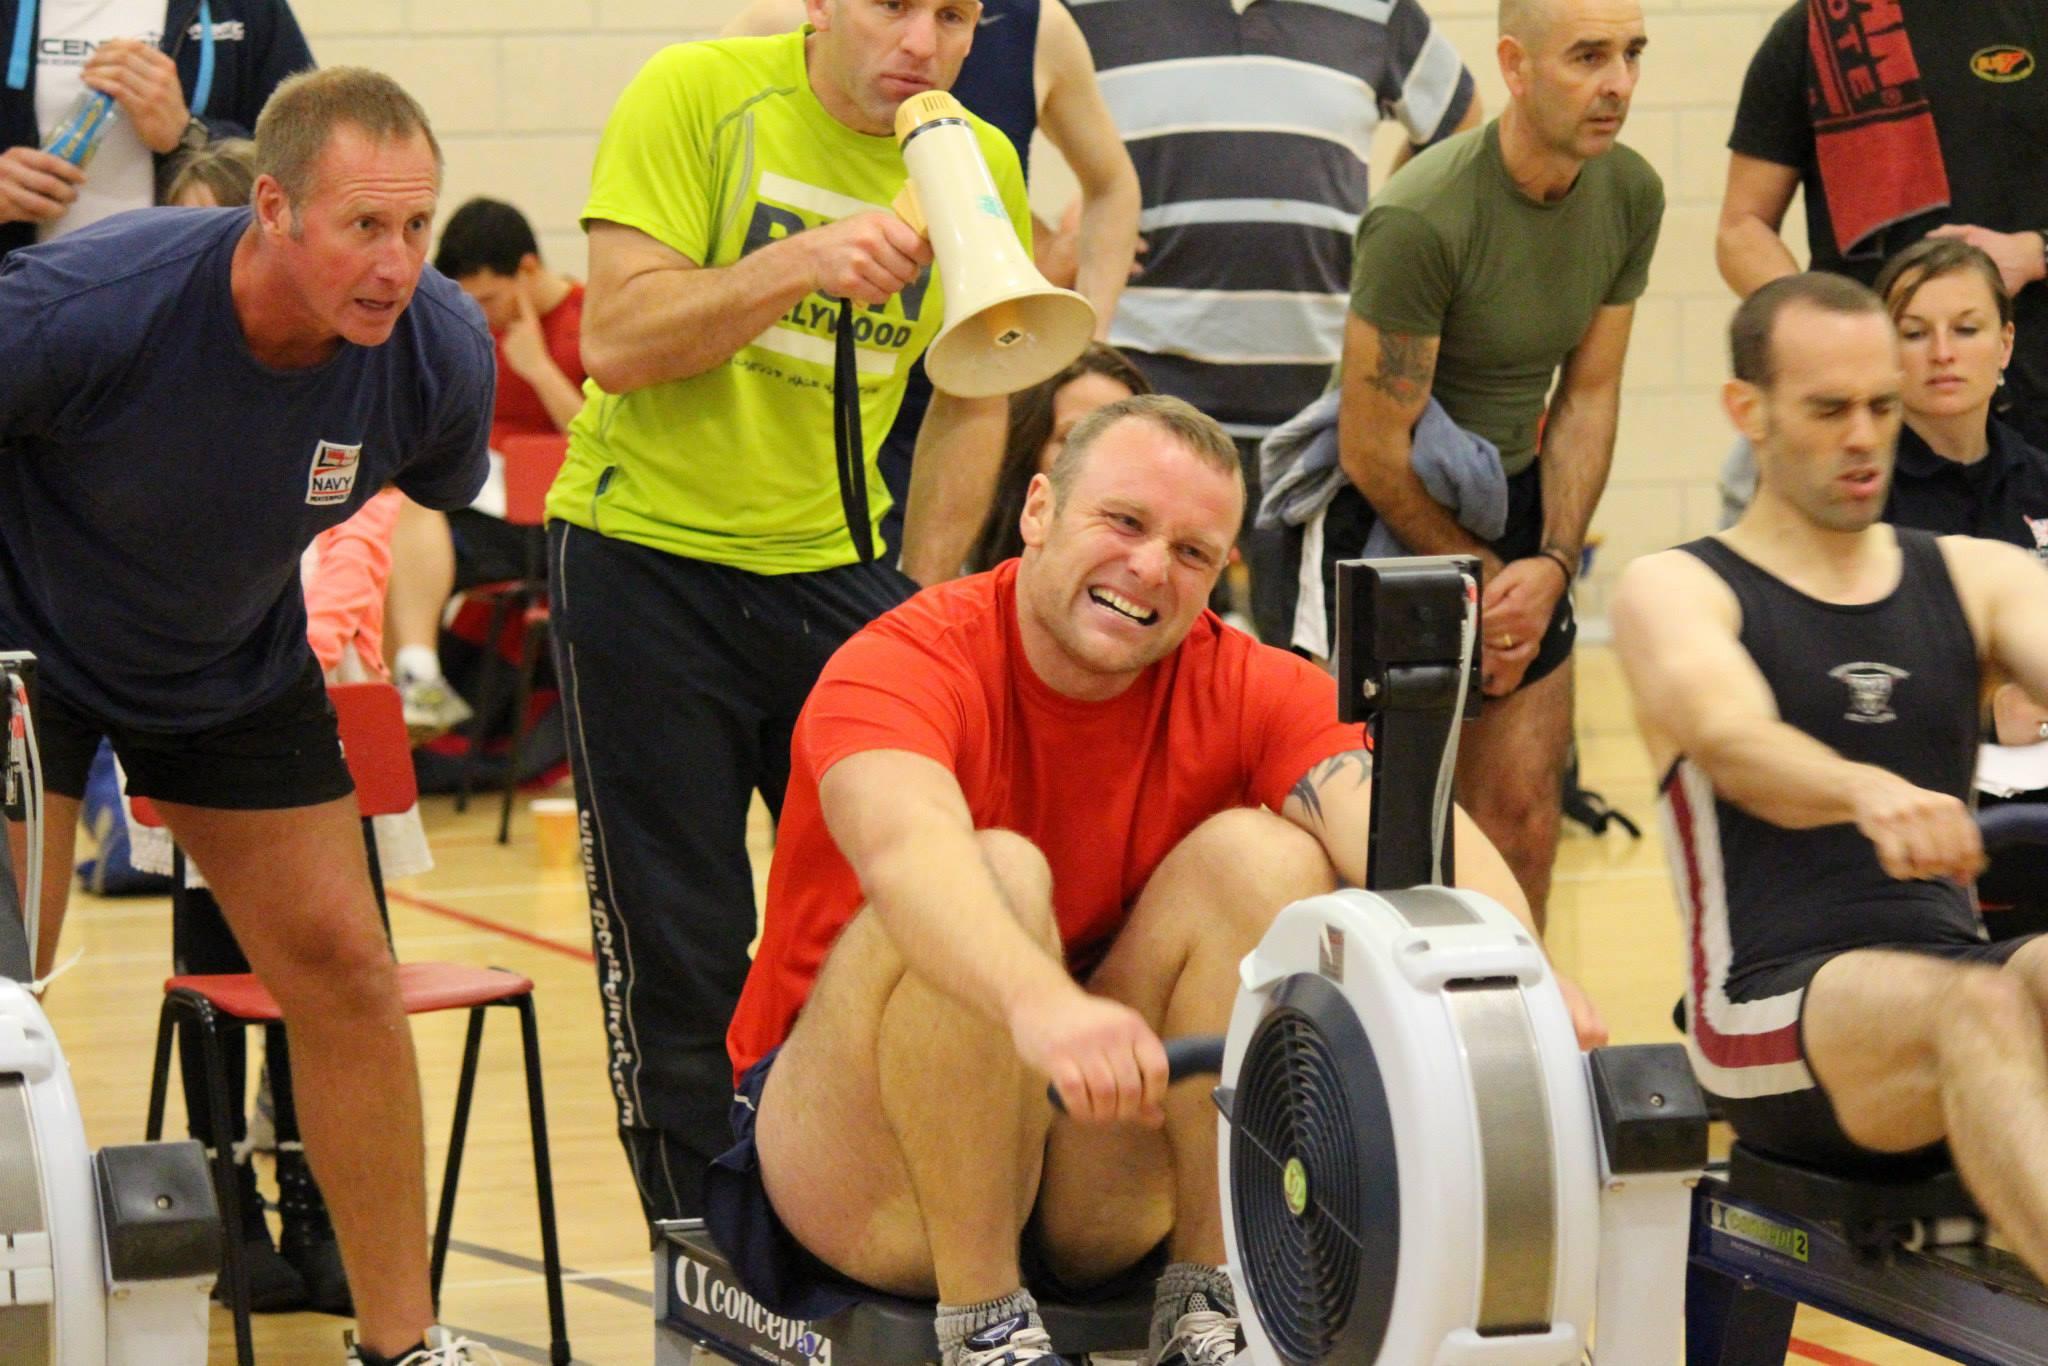 Bristol Indoor Championships 2013